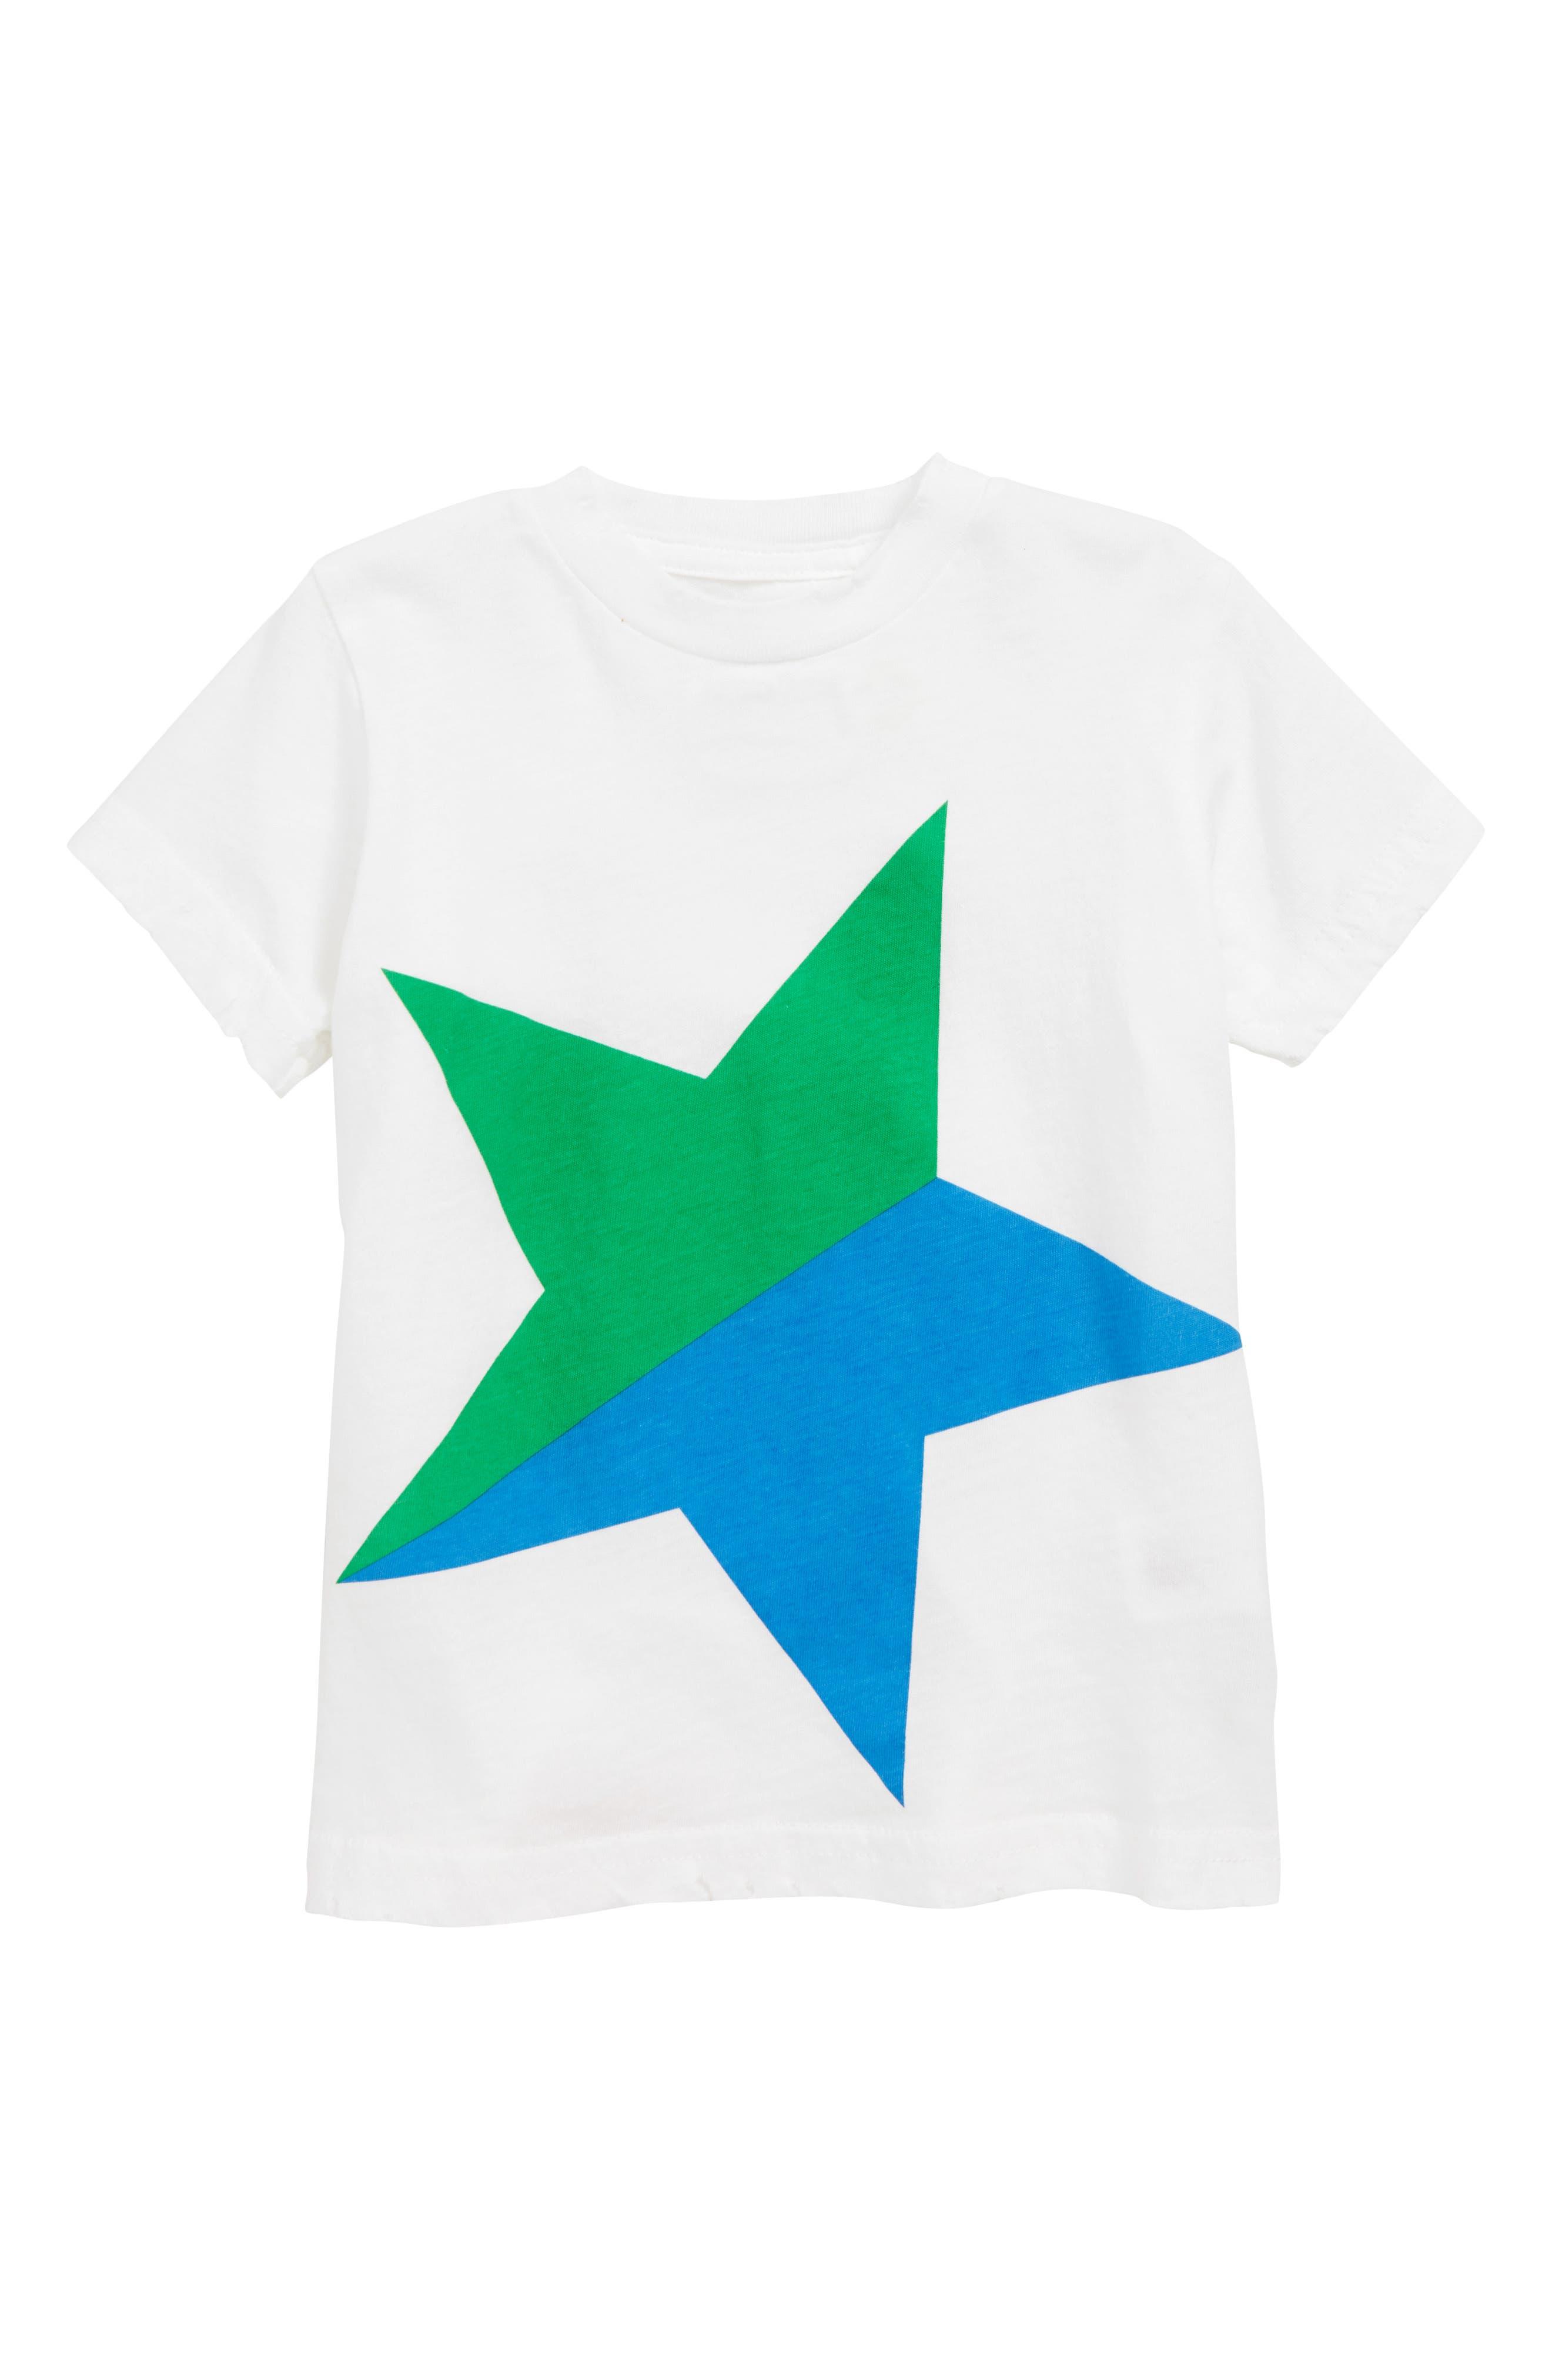 NUNUNU, Colorful Star T-Shirt, Main thumbnail 1, color, WHITE/ GREEN